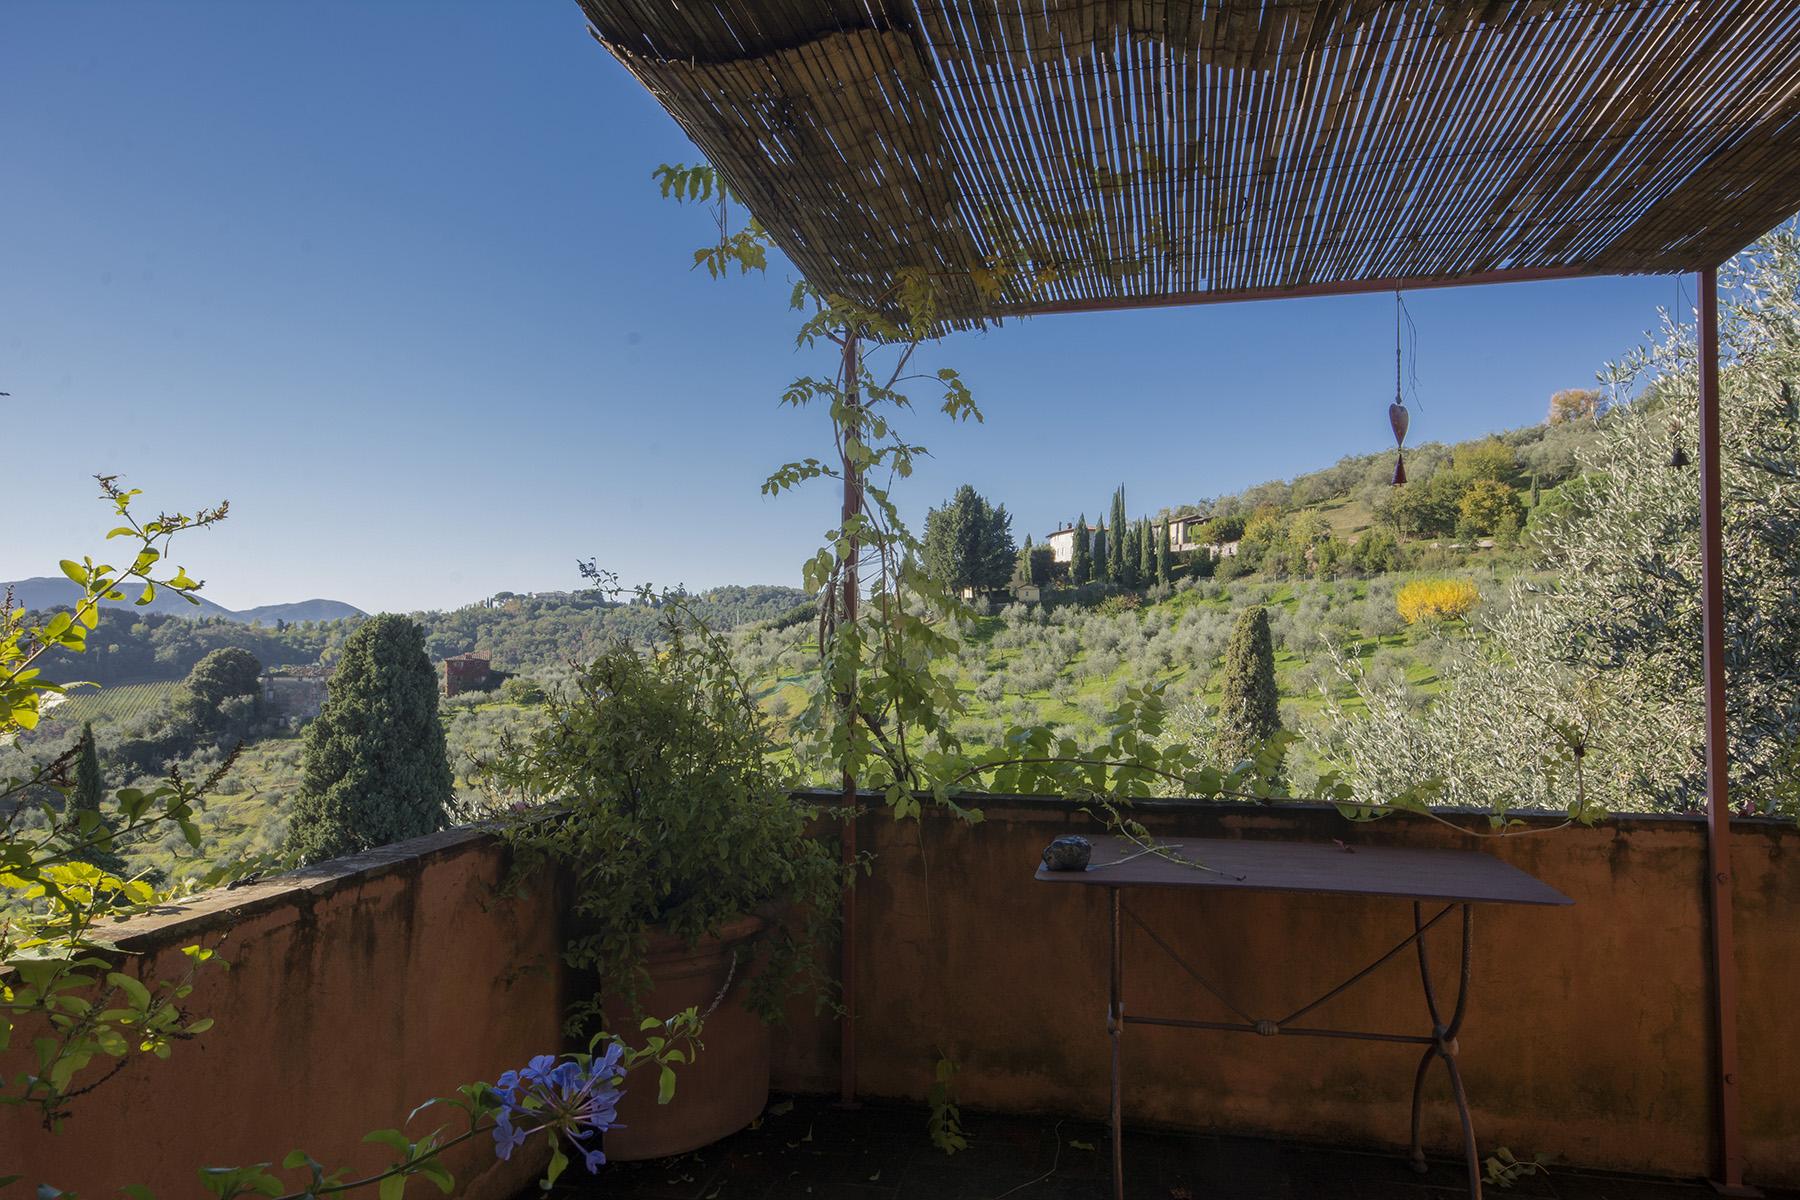 Rustico in Vendita a Lucca: 5 locali, 540 mq - Foto 18